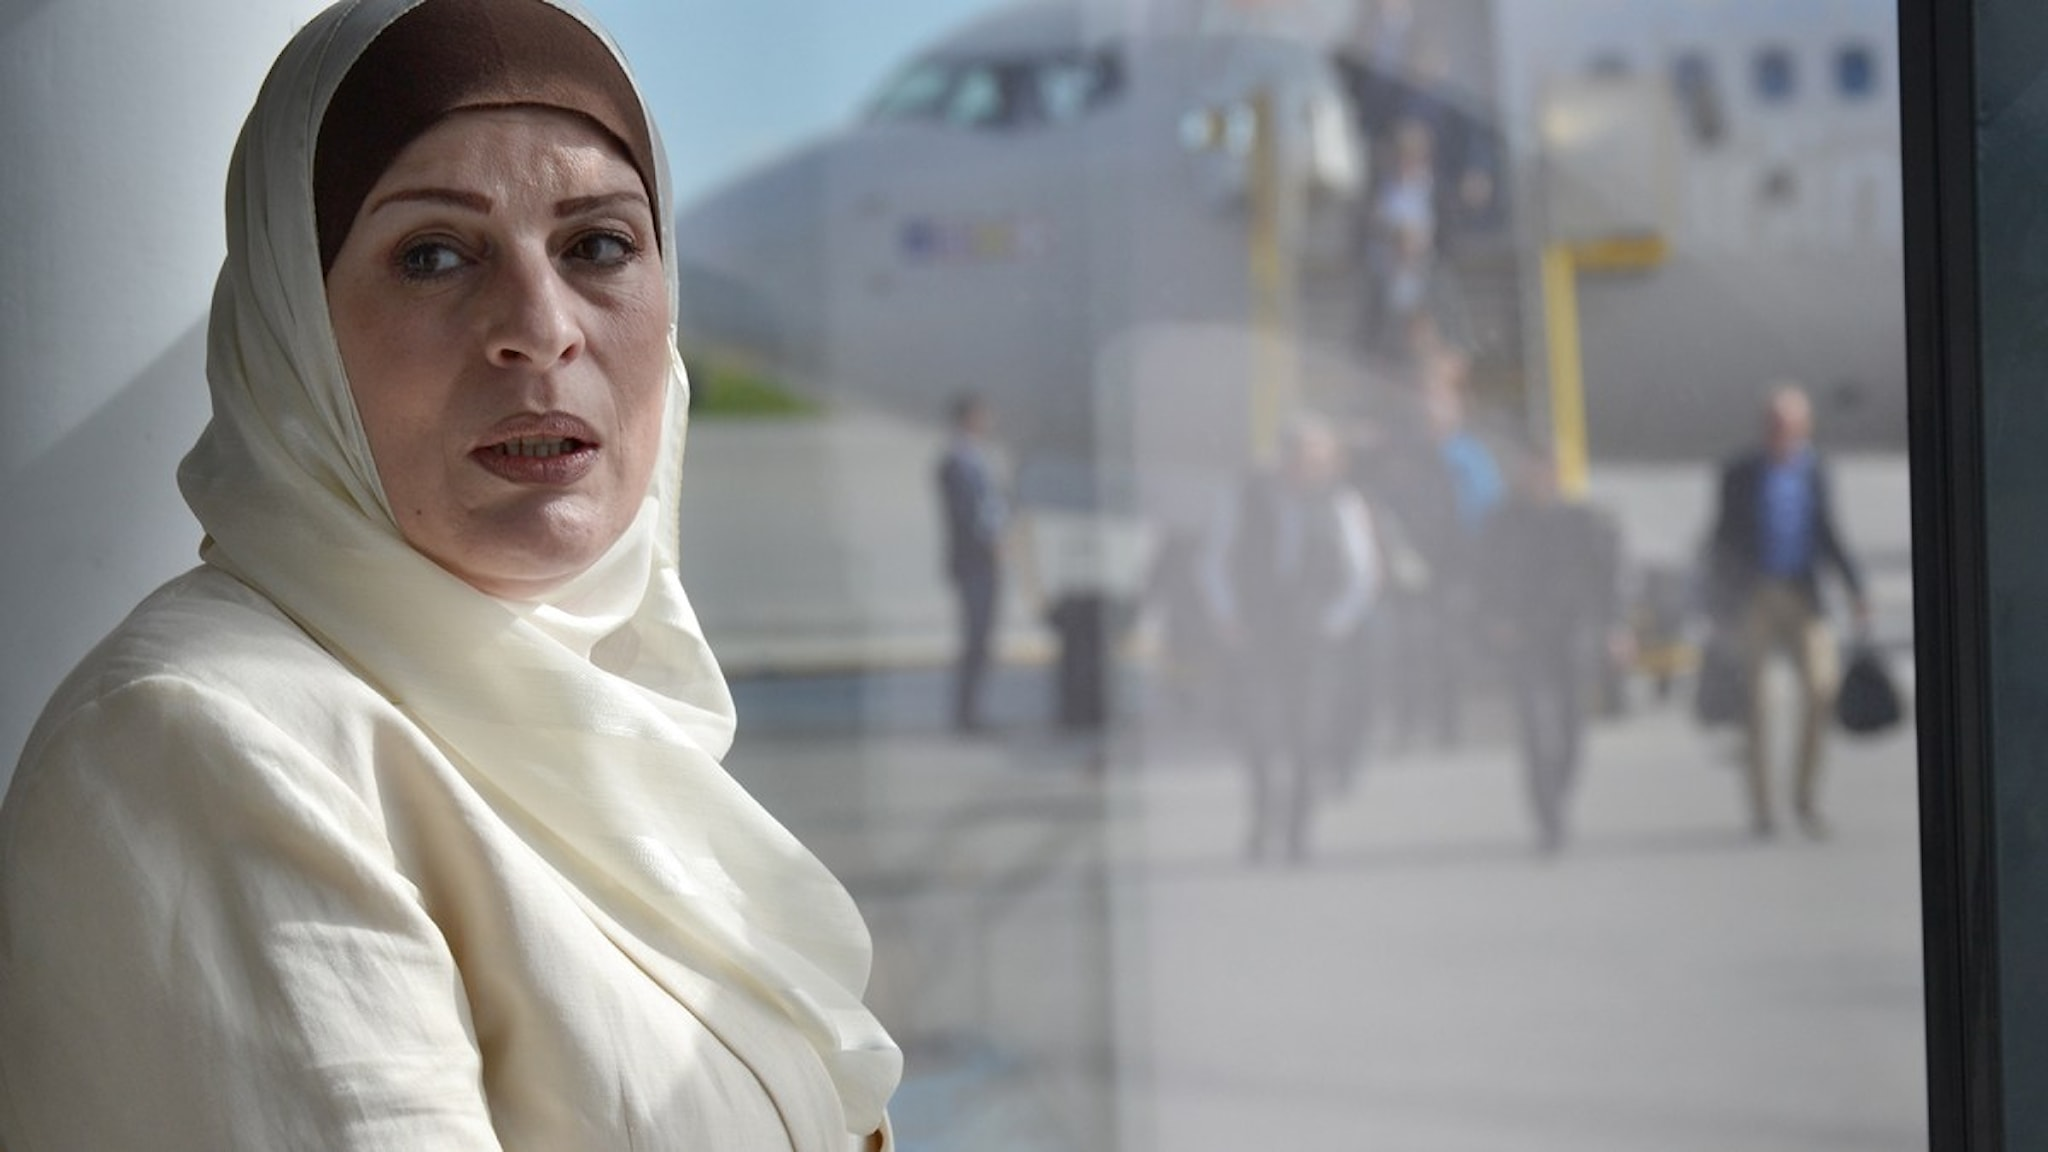 Soha Arifi på flygplatsen. Foto: Olov Antonsson/Sveriges Radio